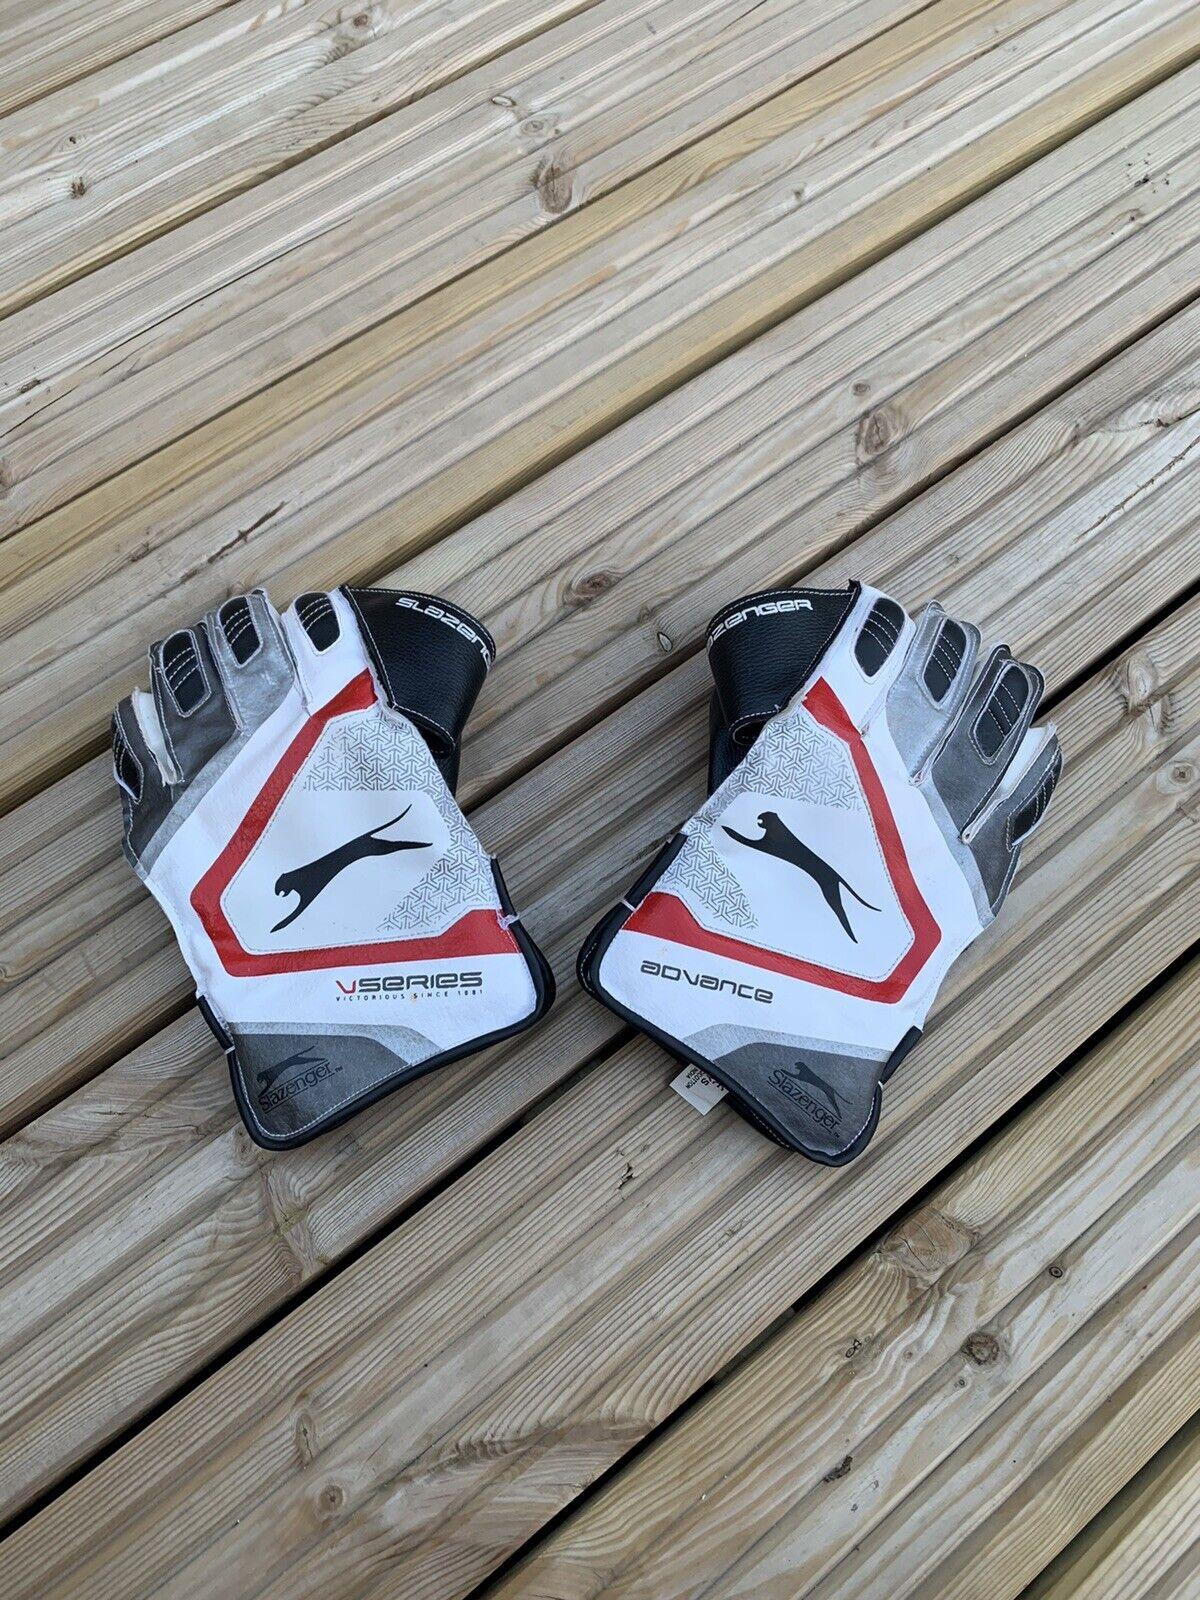 Slazenger Advance V Series Wicketkeeping Cricket Gloves